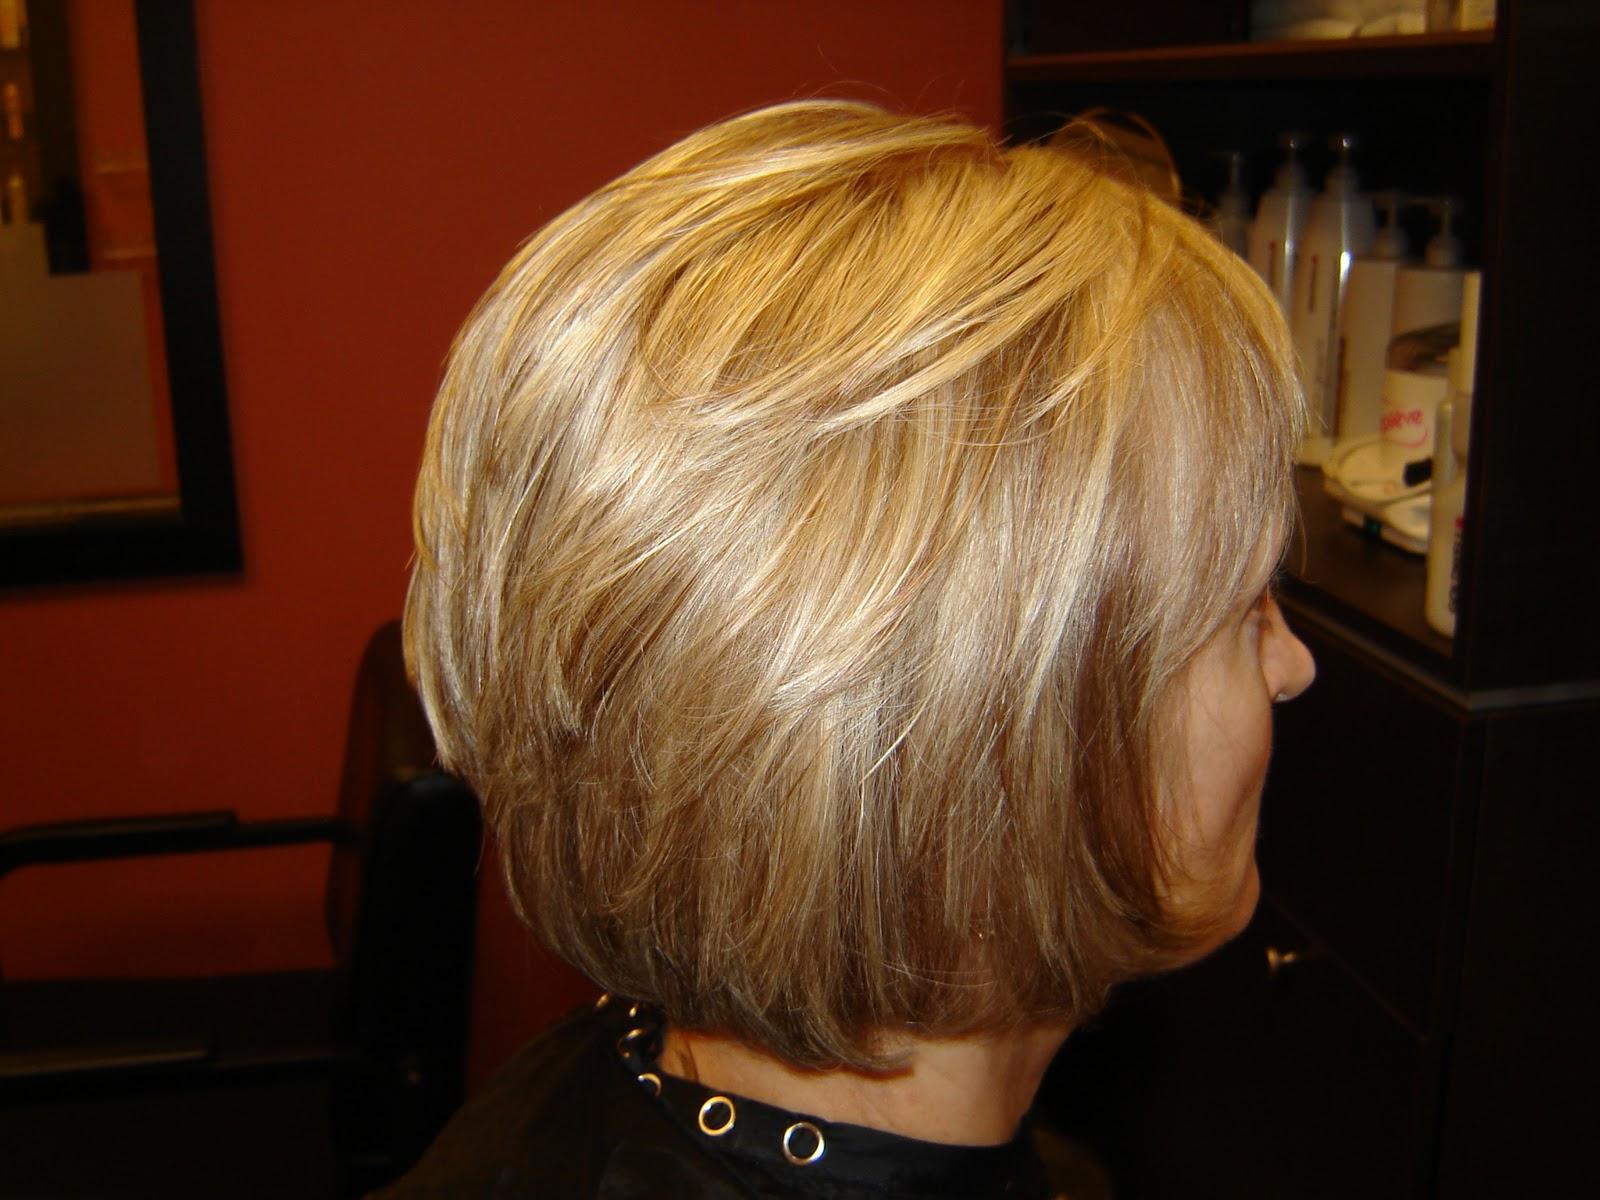 ... Kearns: Lynn Lakshas, Golden Blonde Base Color with Carmel Lowlights